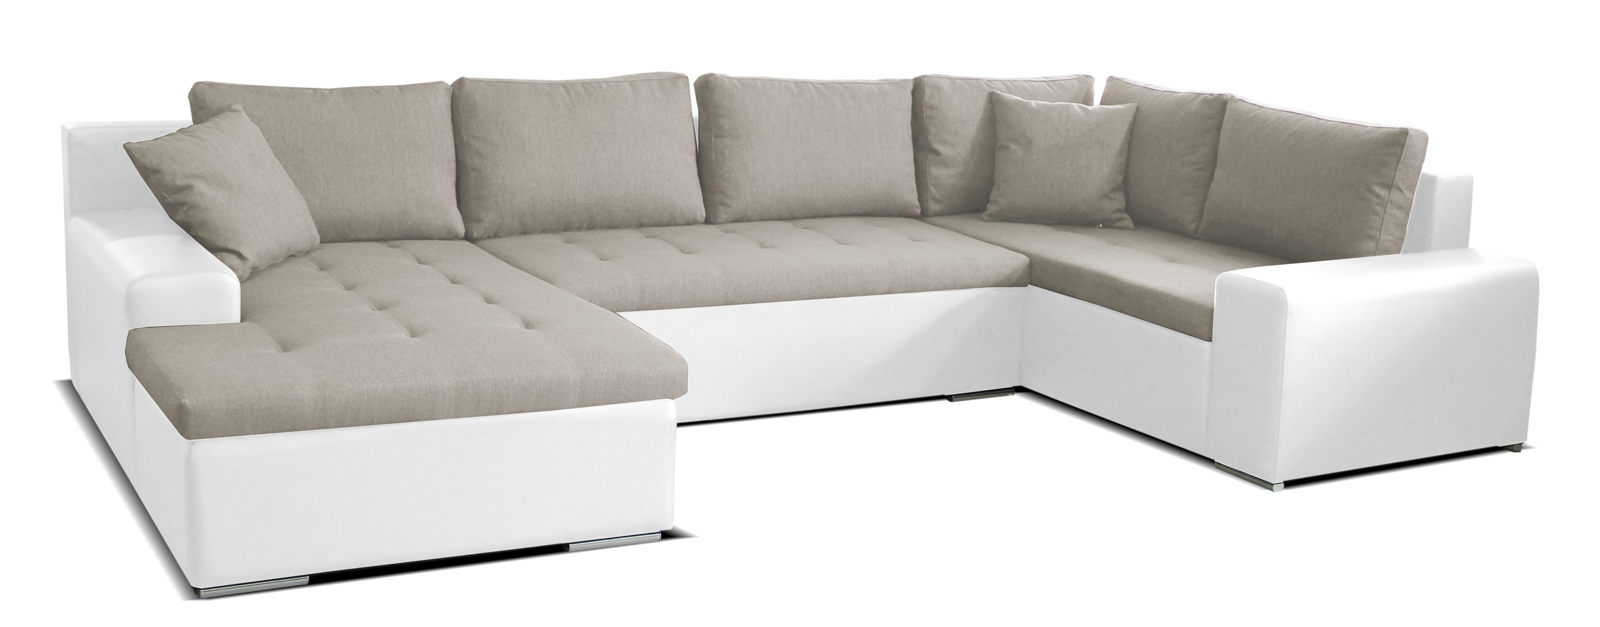 Rohová sedací souprava U - Po-Sed - Moreno L+2+BL (béžová + bílá) (L)